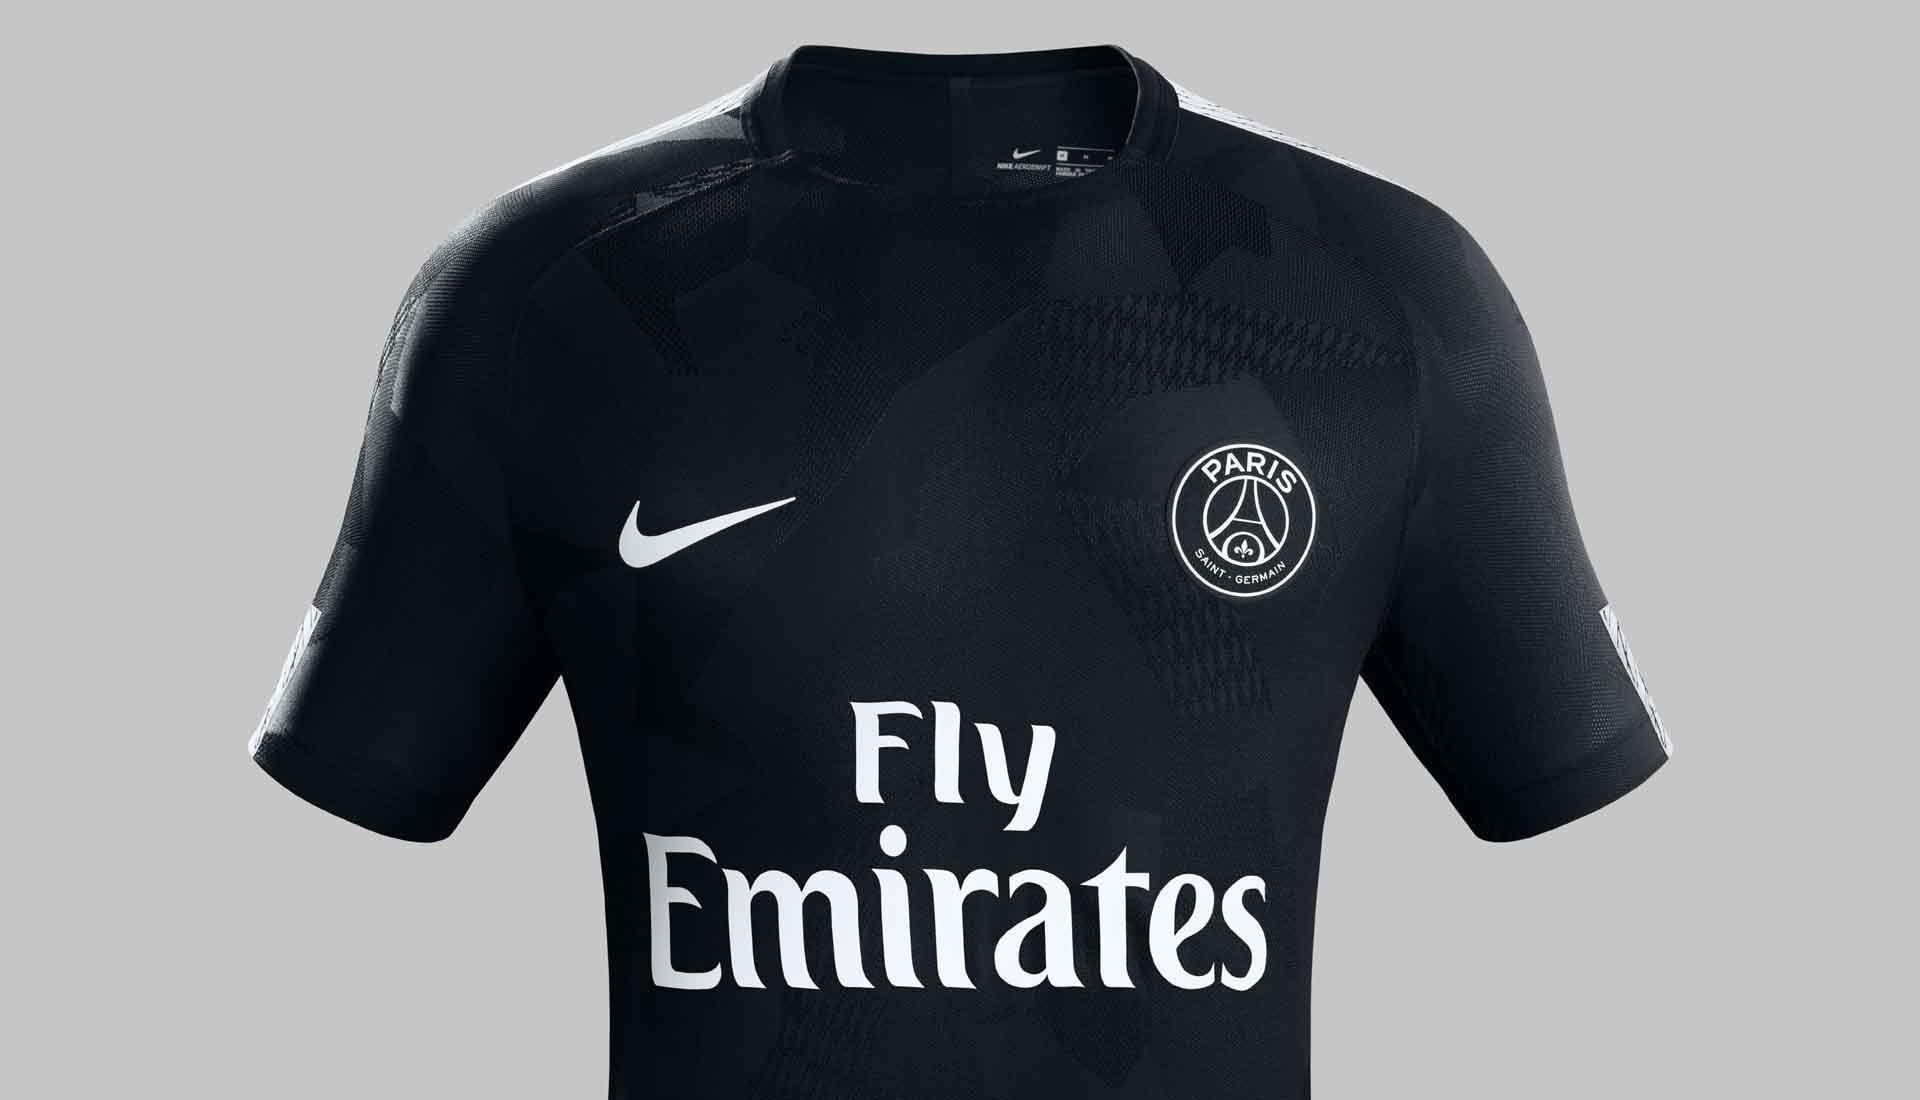 huge selection of 24326 1283c Neymar Reveals PSG 17/18 Nike Third Kit - SoccerBible